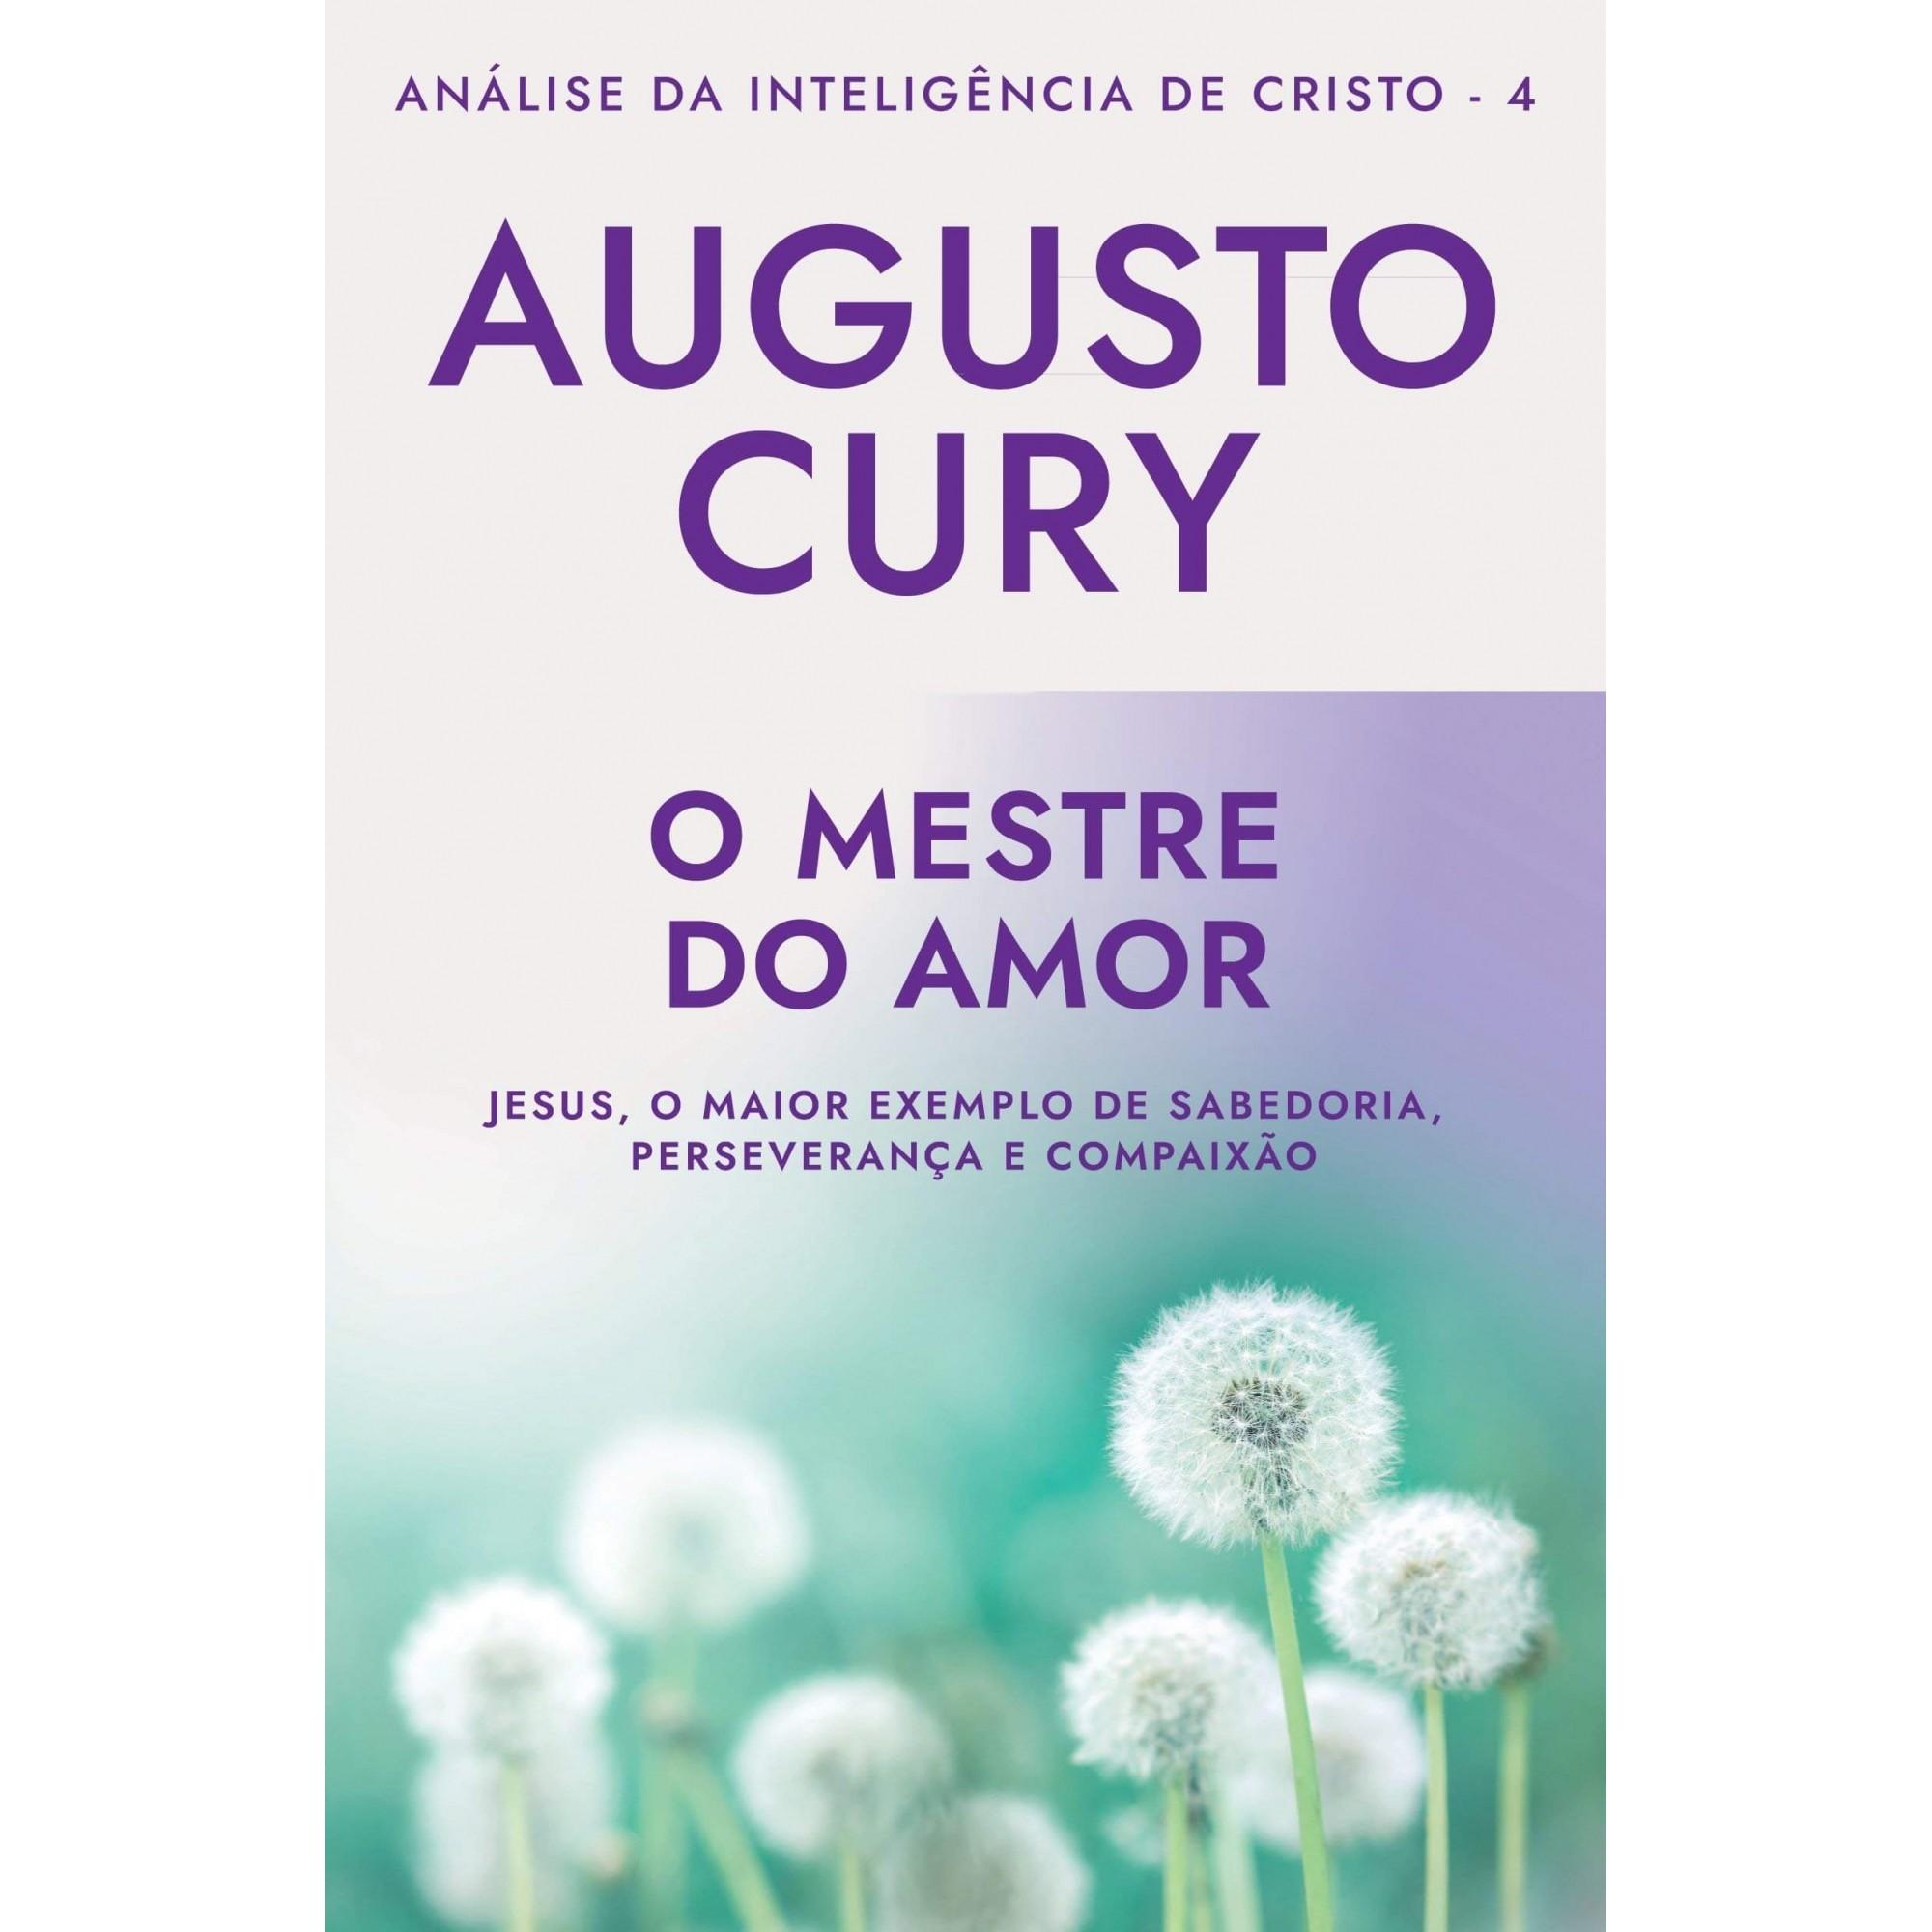 Livro O Mestre do Amor Analise da Inteligencia Augusto Cury